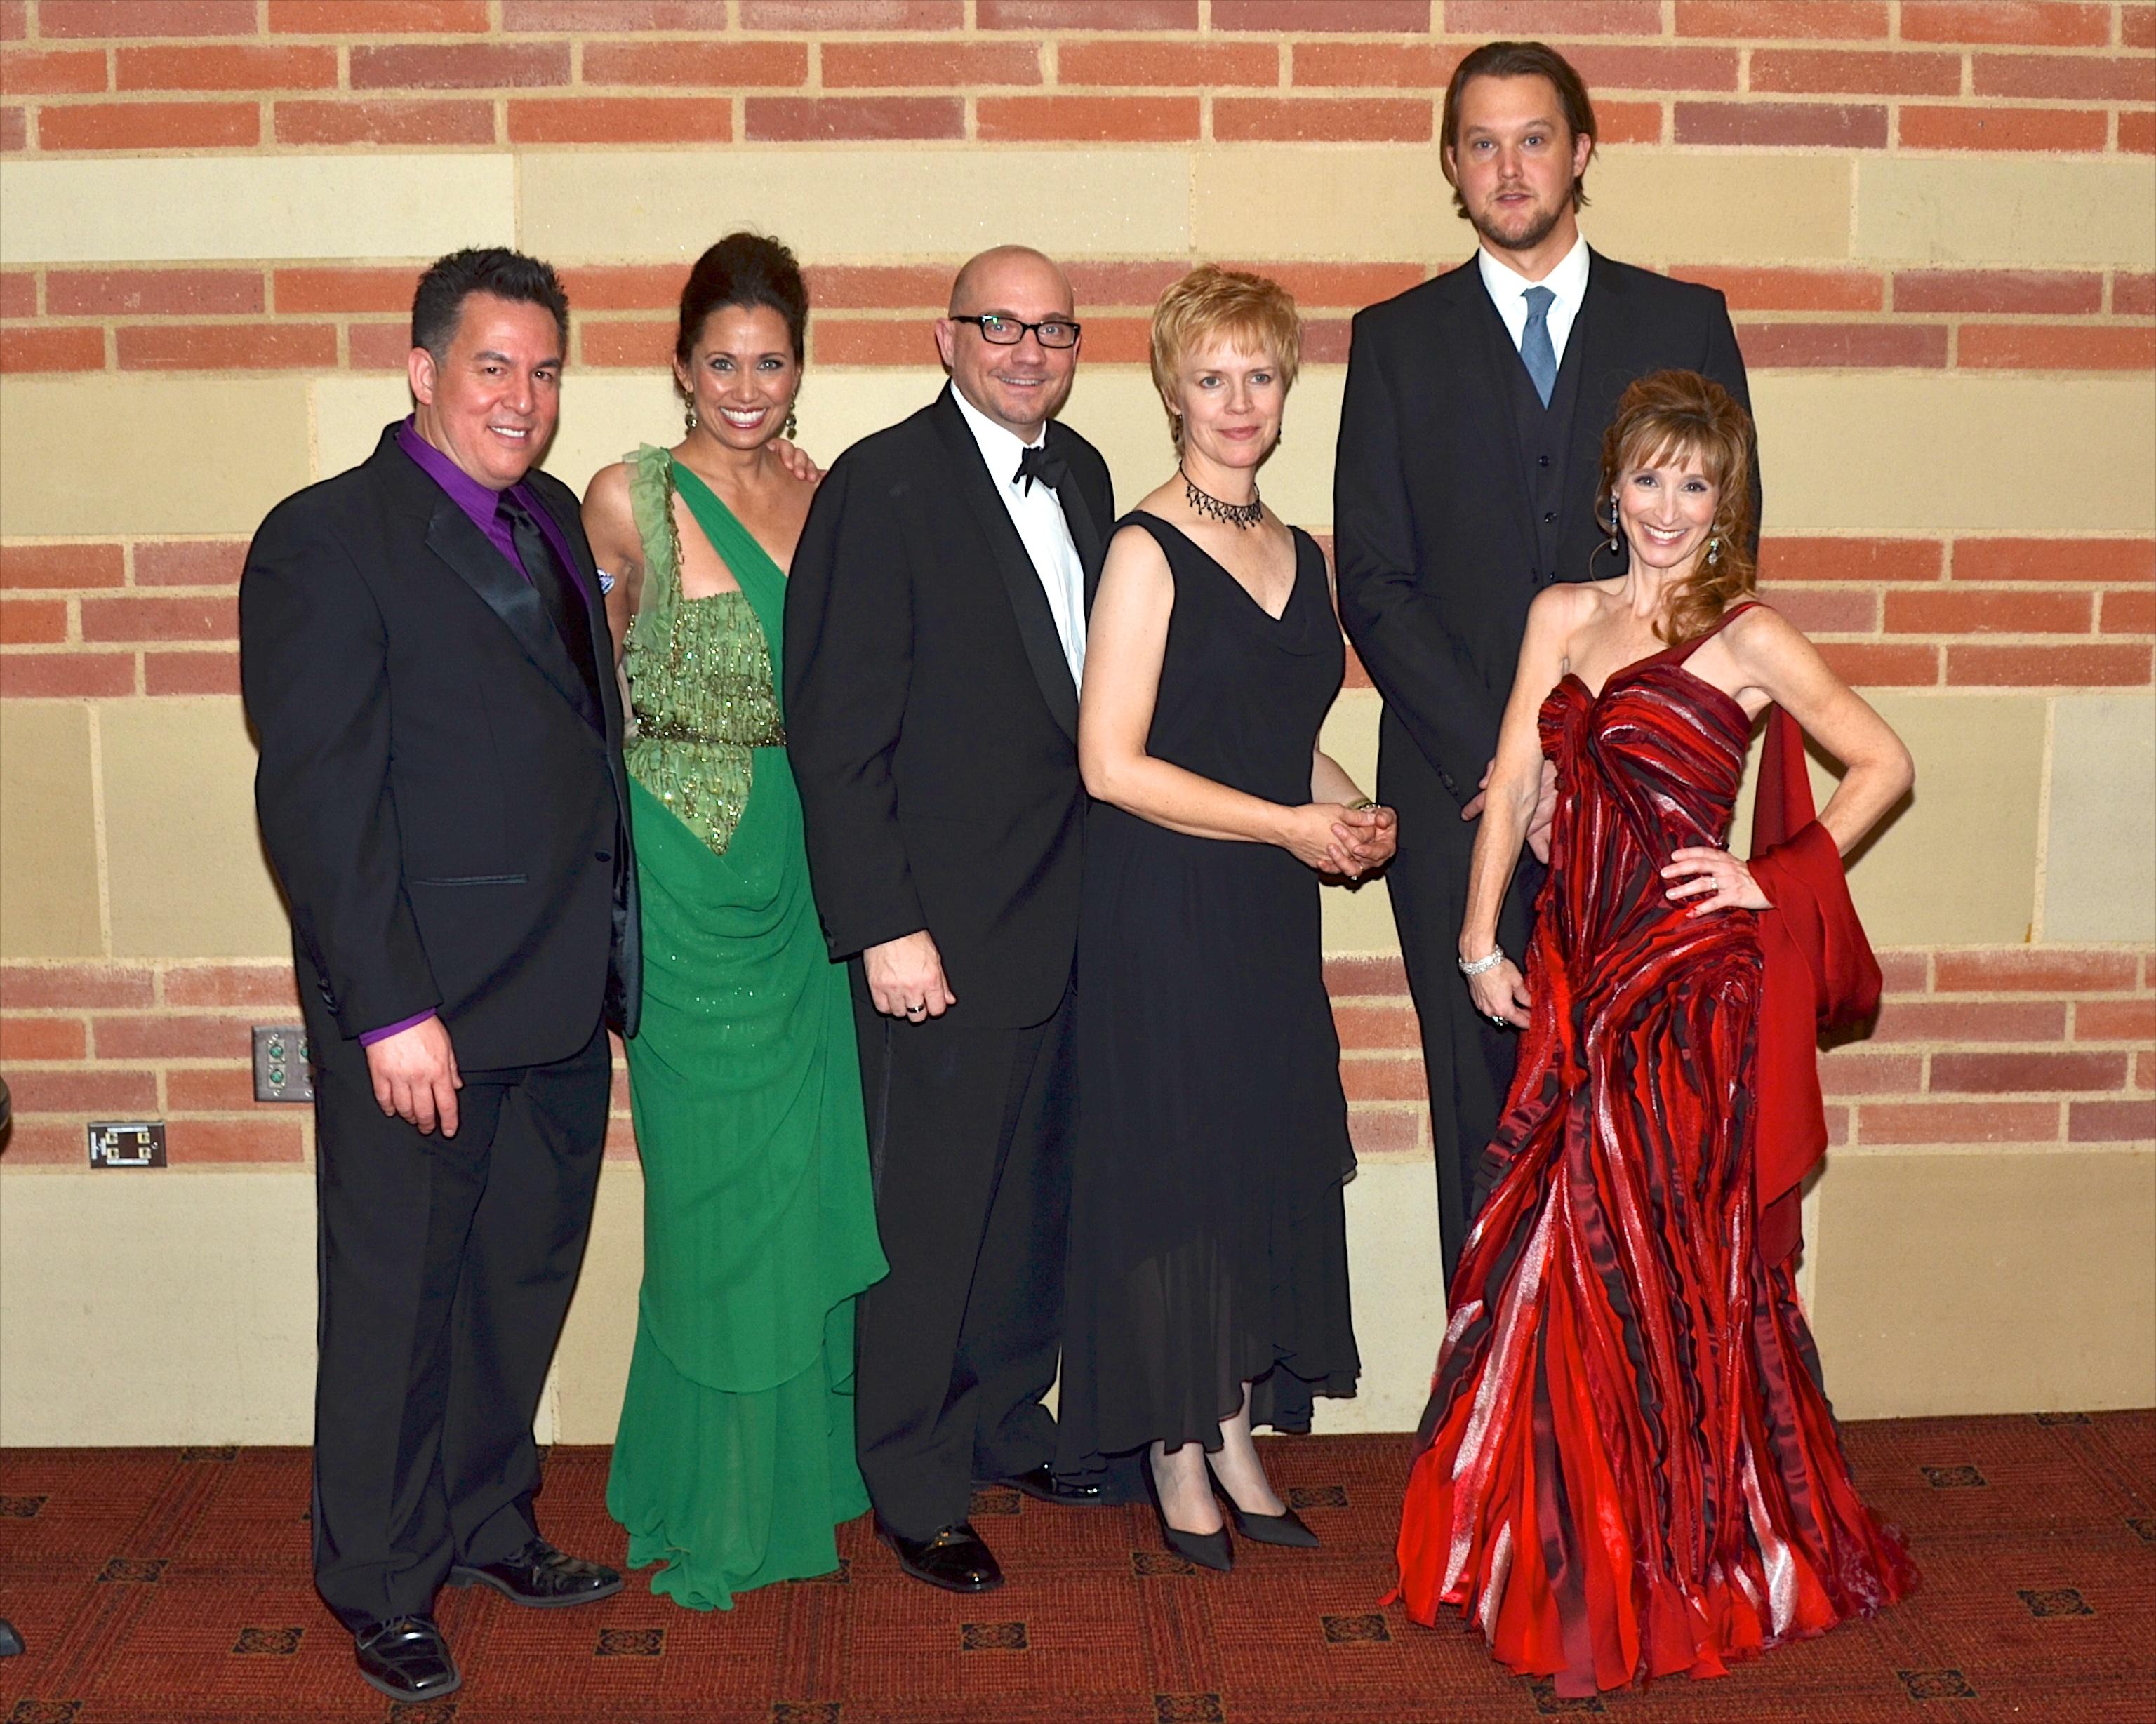 David Dirks, Diana Lansleen, Brian & Peggy Ochab, Jeff Jones & Me